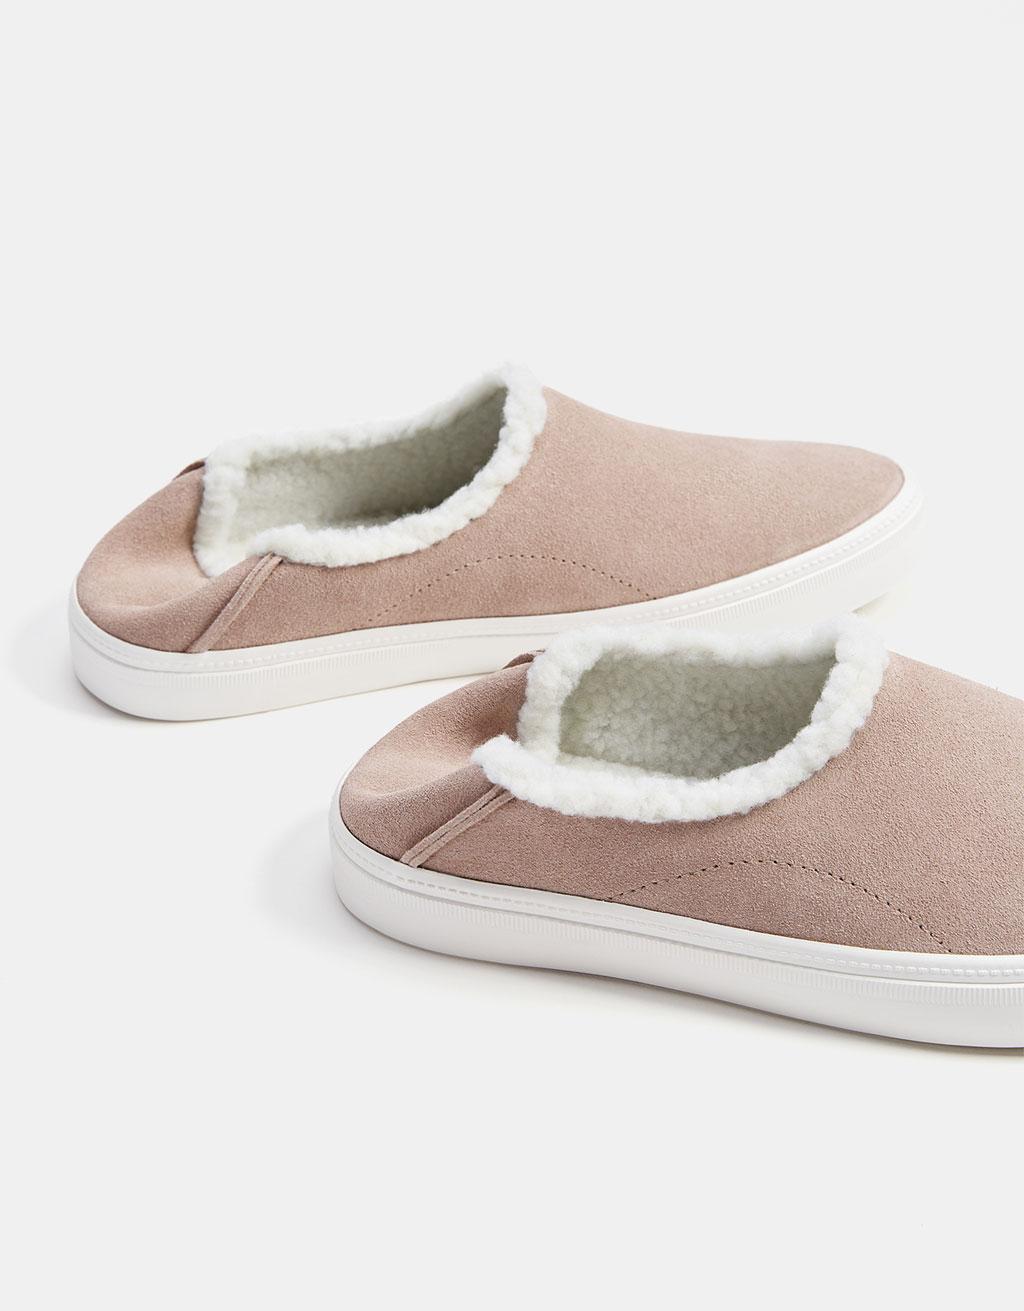 Fleecy leather slippers